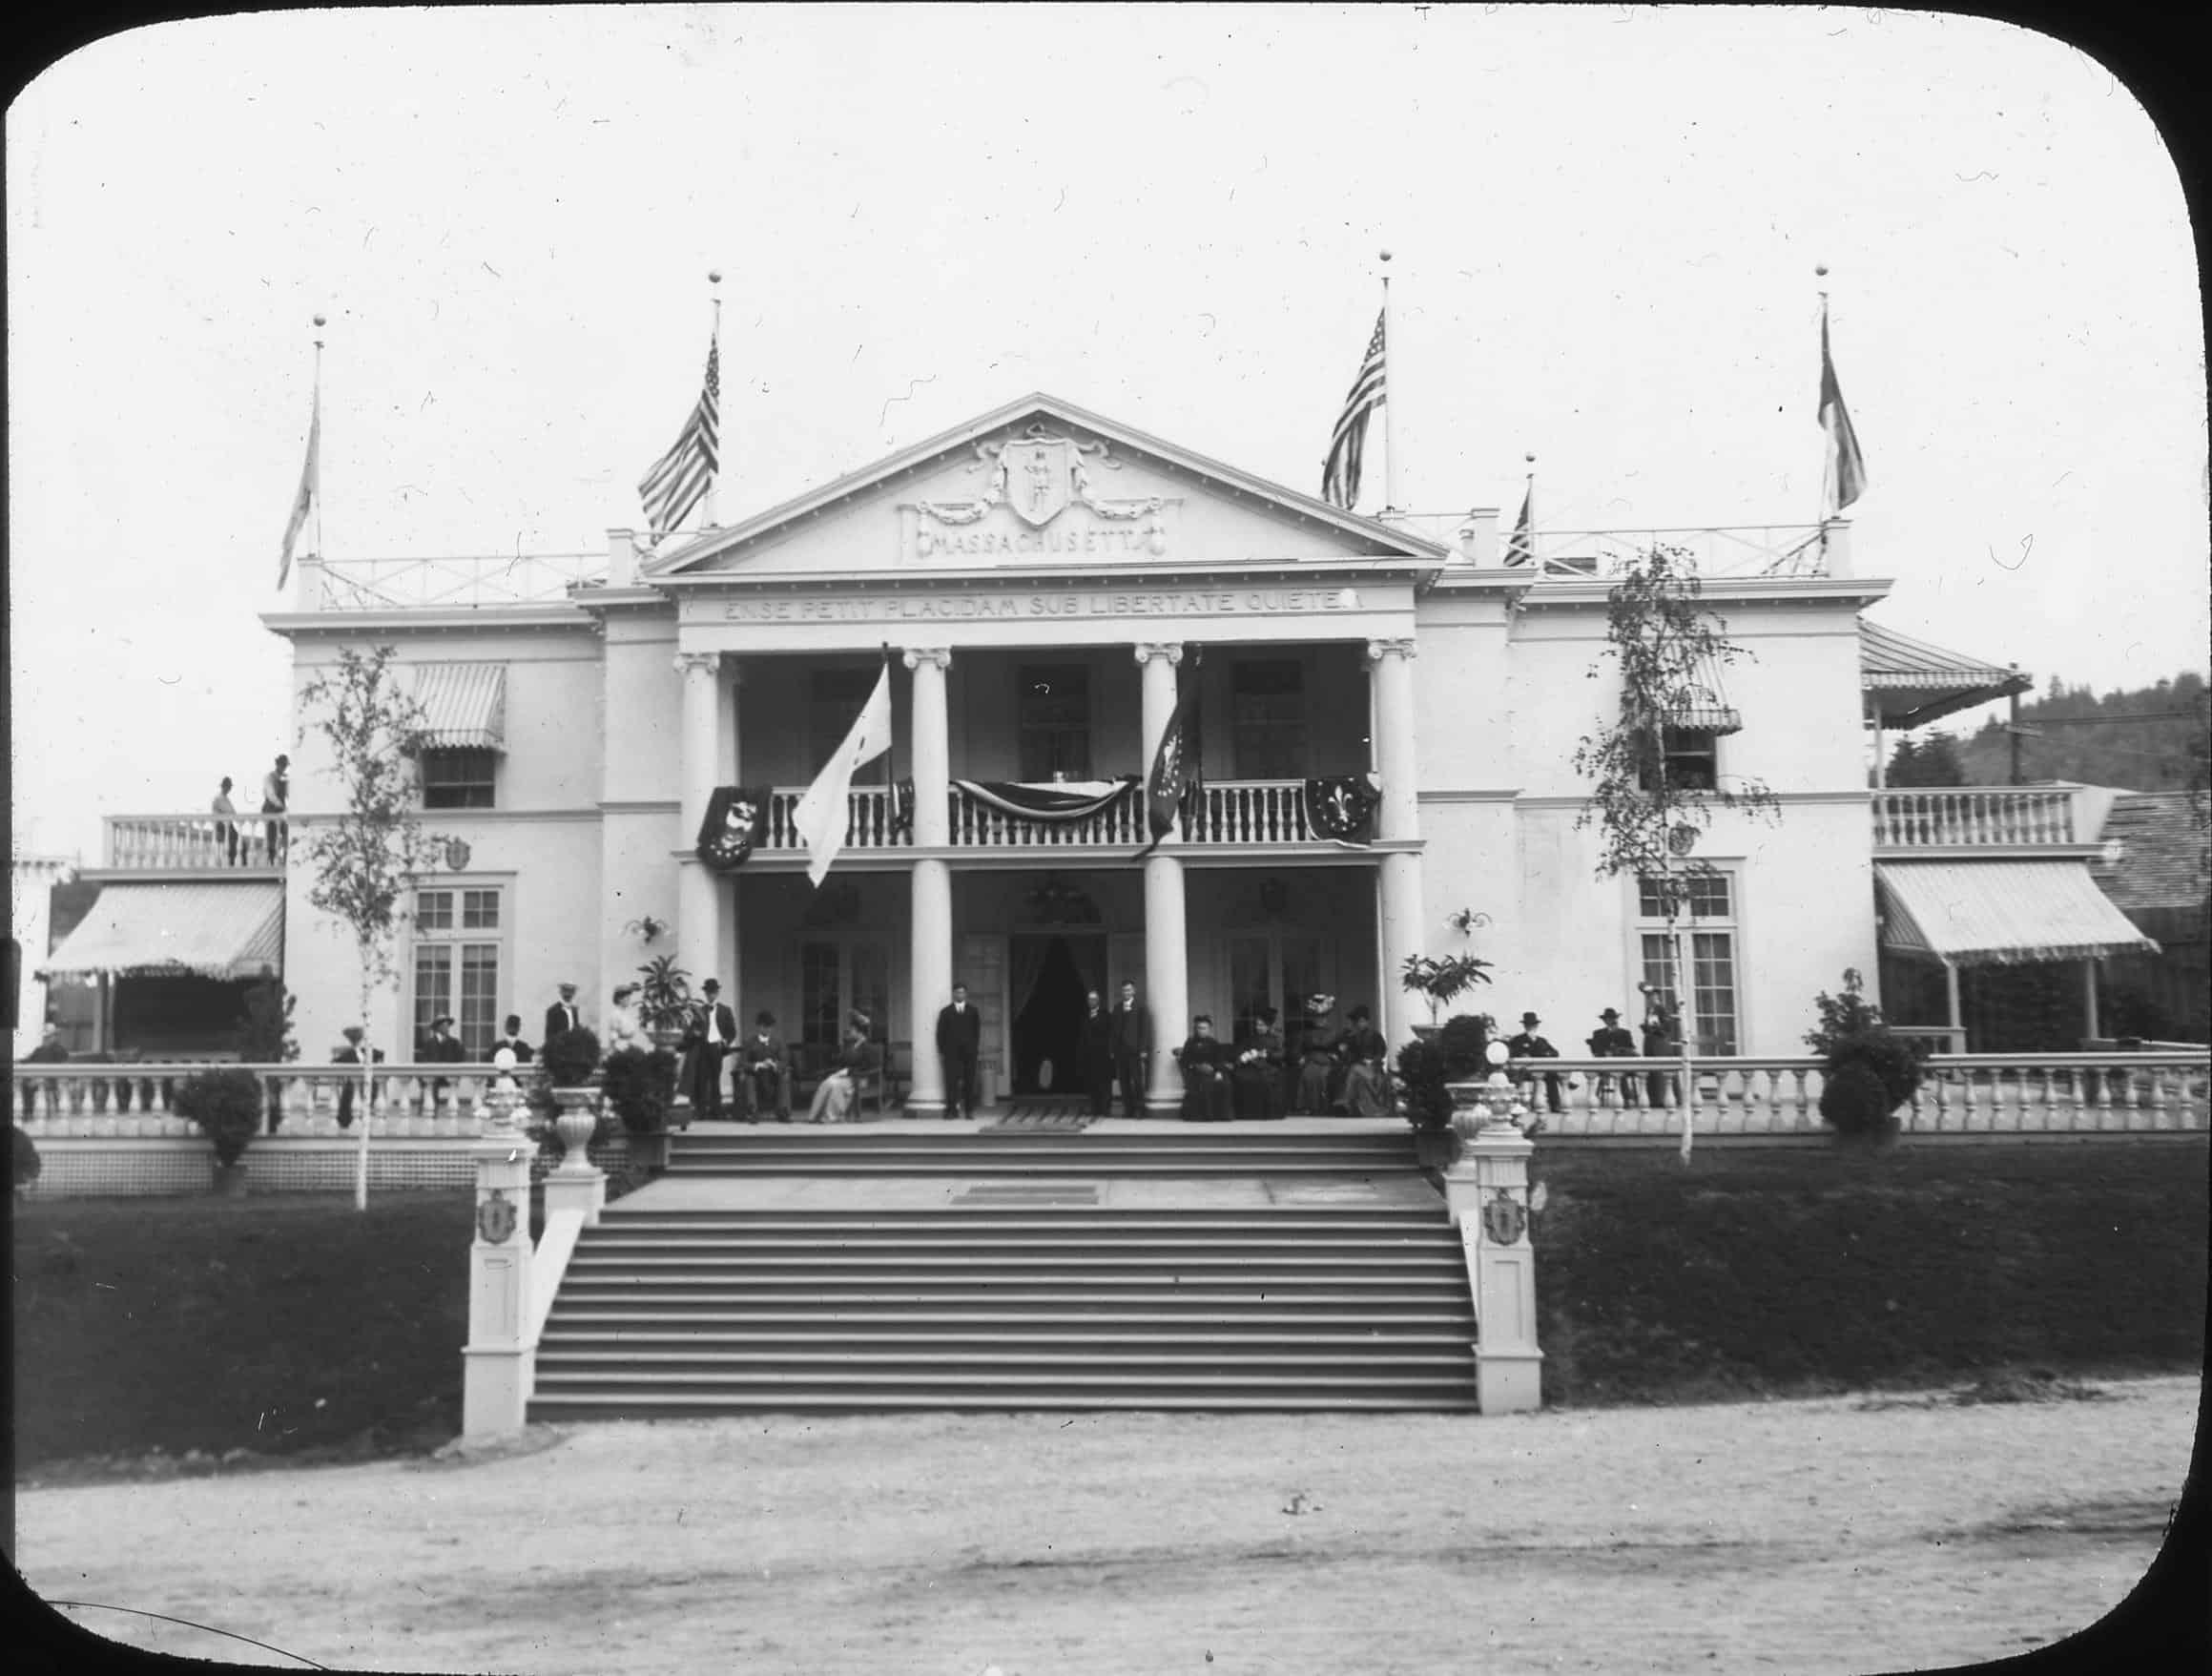 13-Massachusetts state exhibit